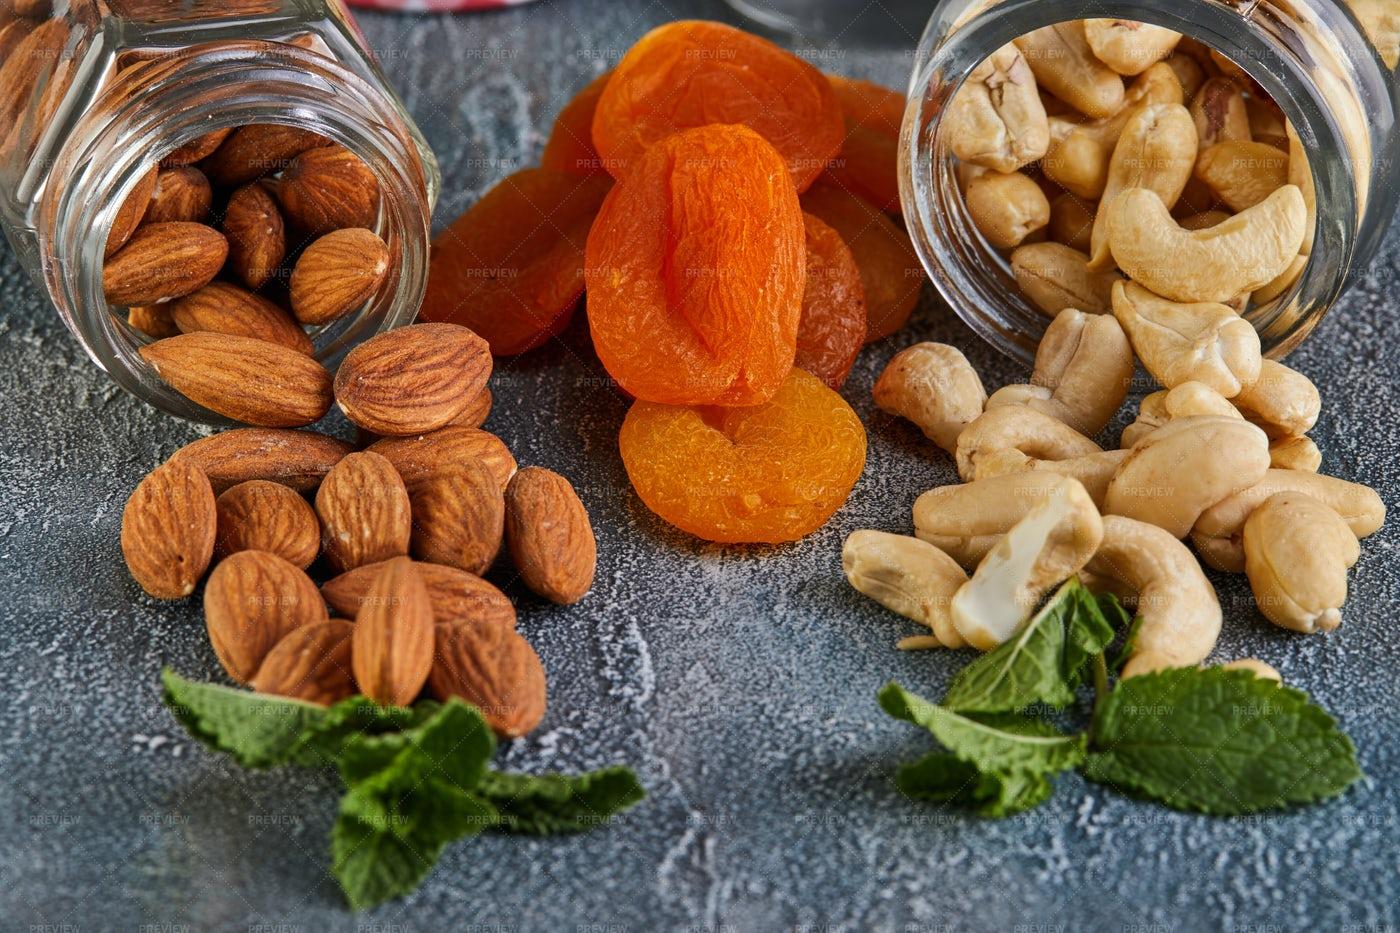 Dry Food: Stock Photos